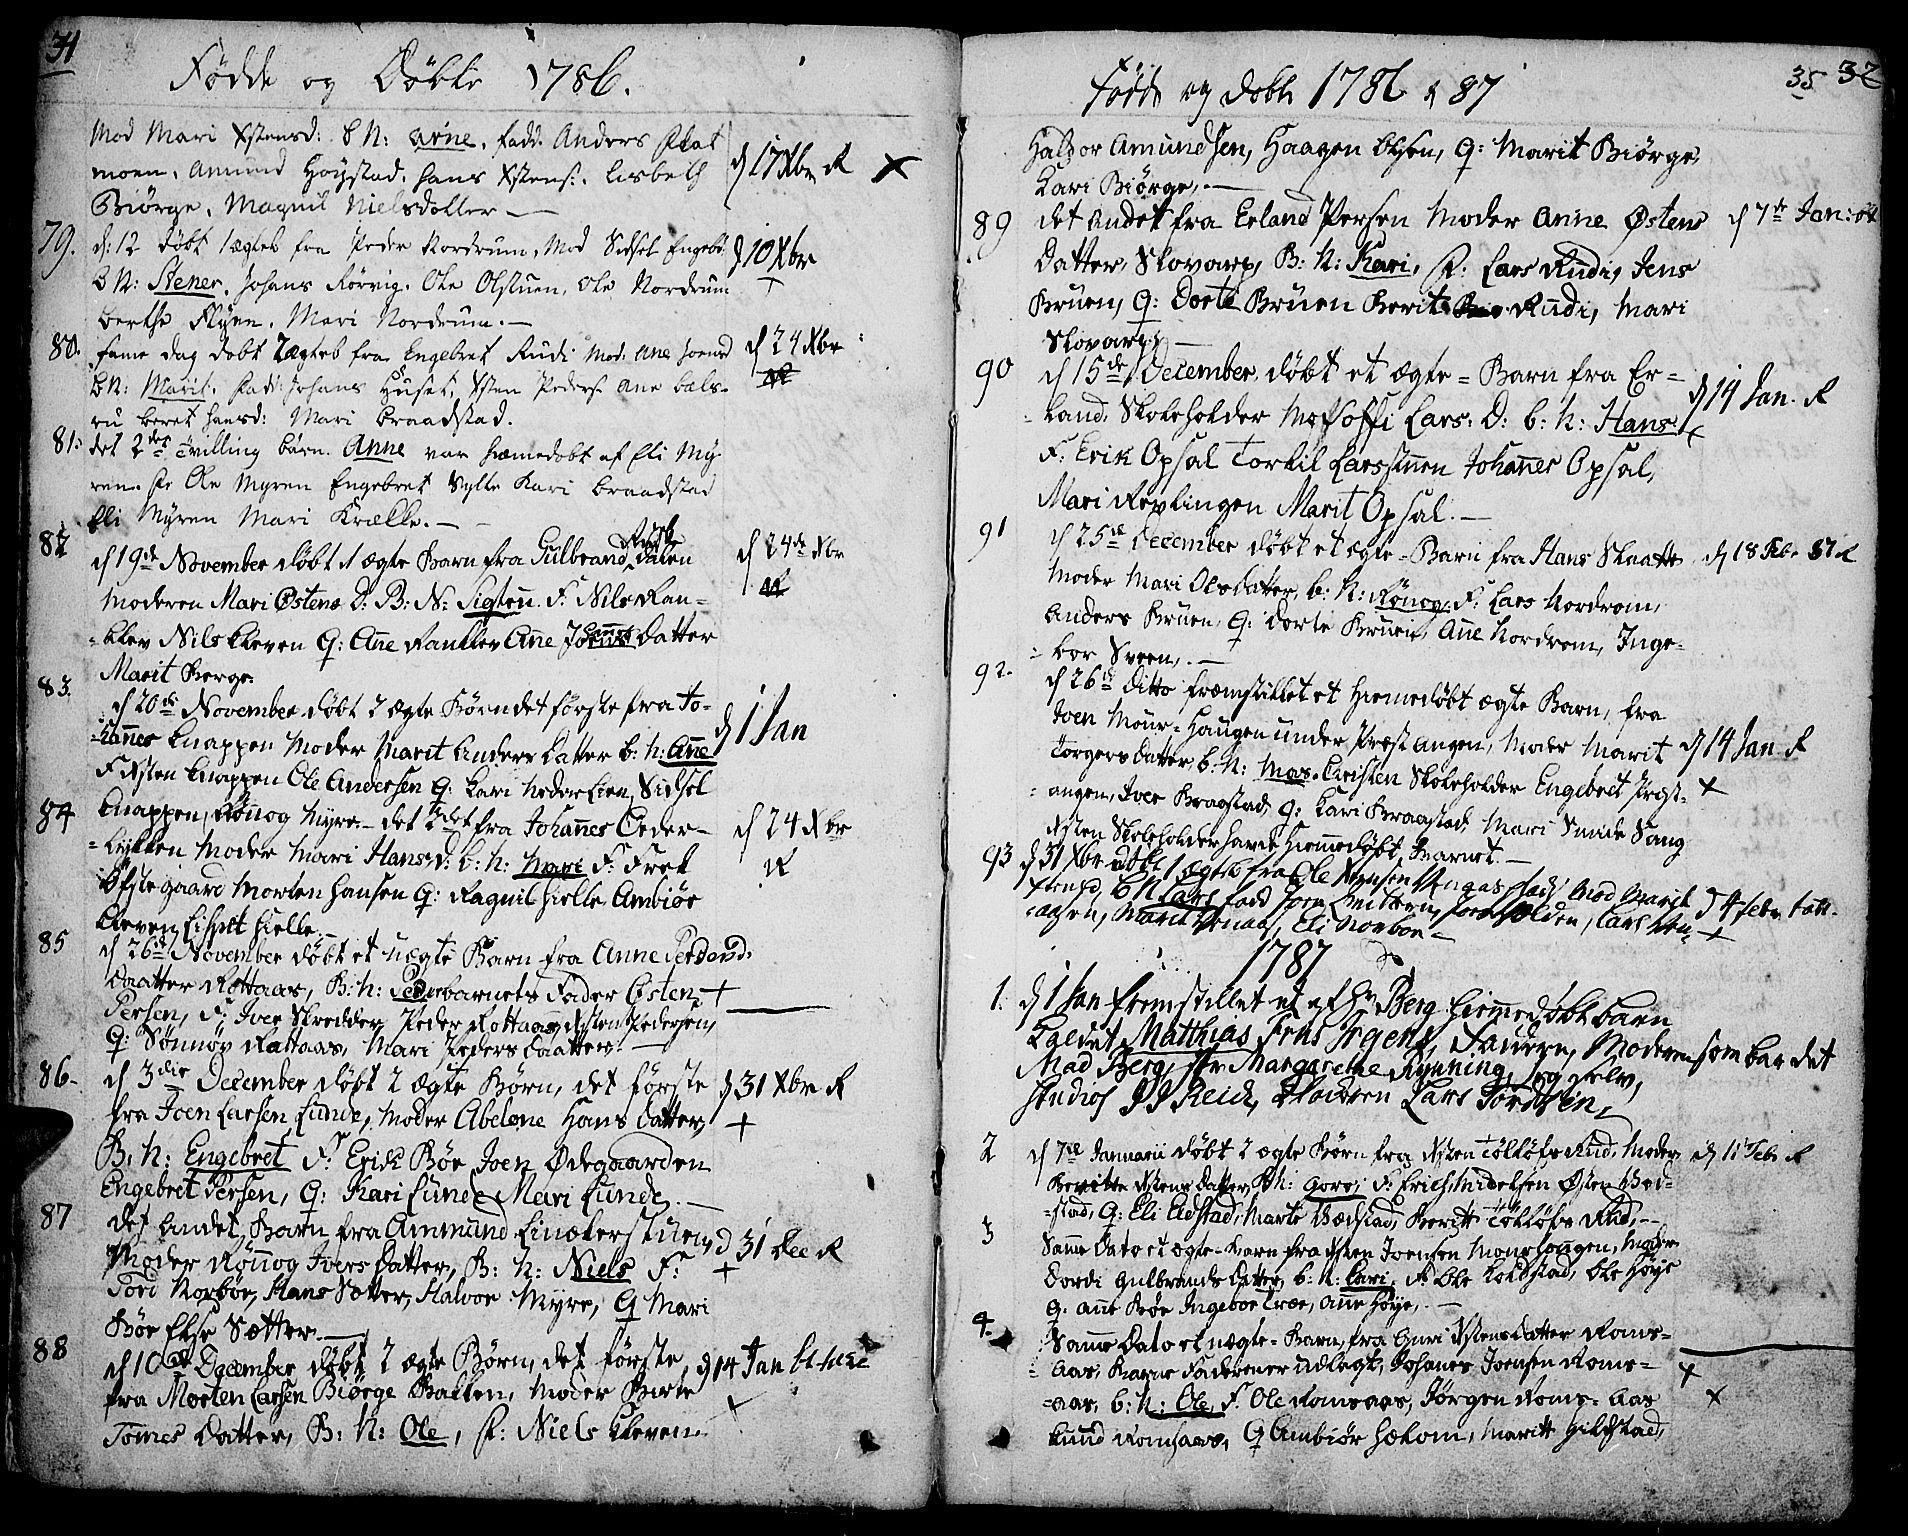 SAH, Ringebu prestekontor, Ministerialbok nr. 3, 1781-1820, s. 34-35